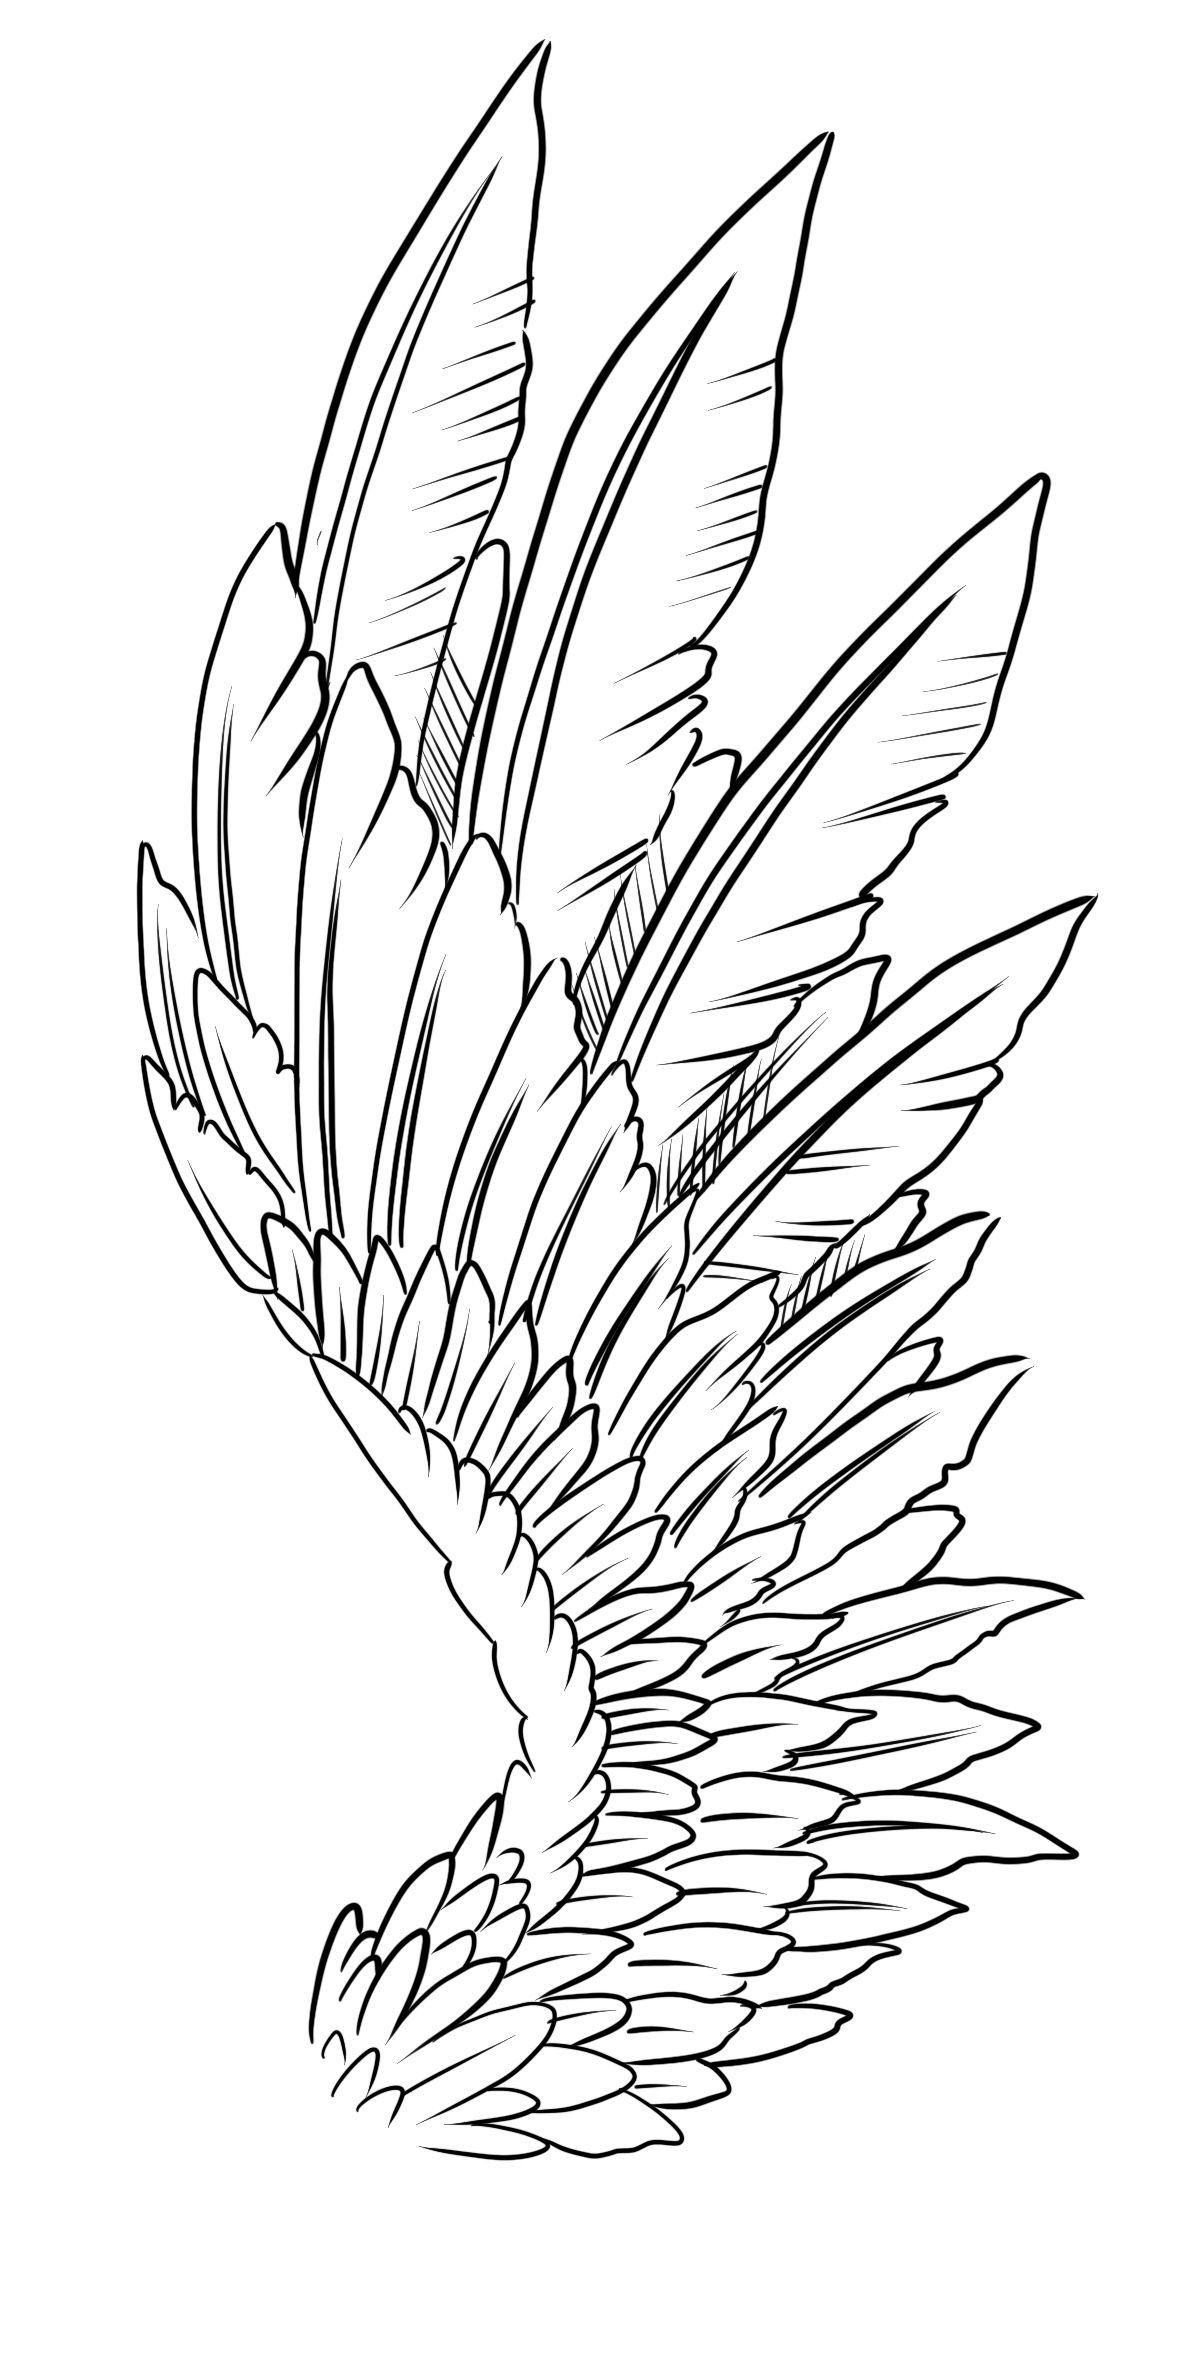 Tattoo Wings Sketch